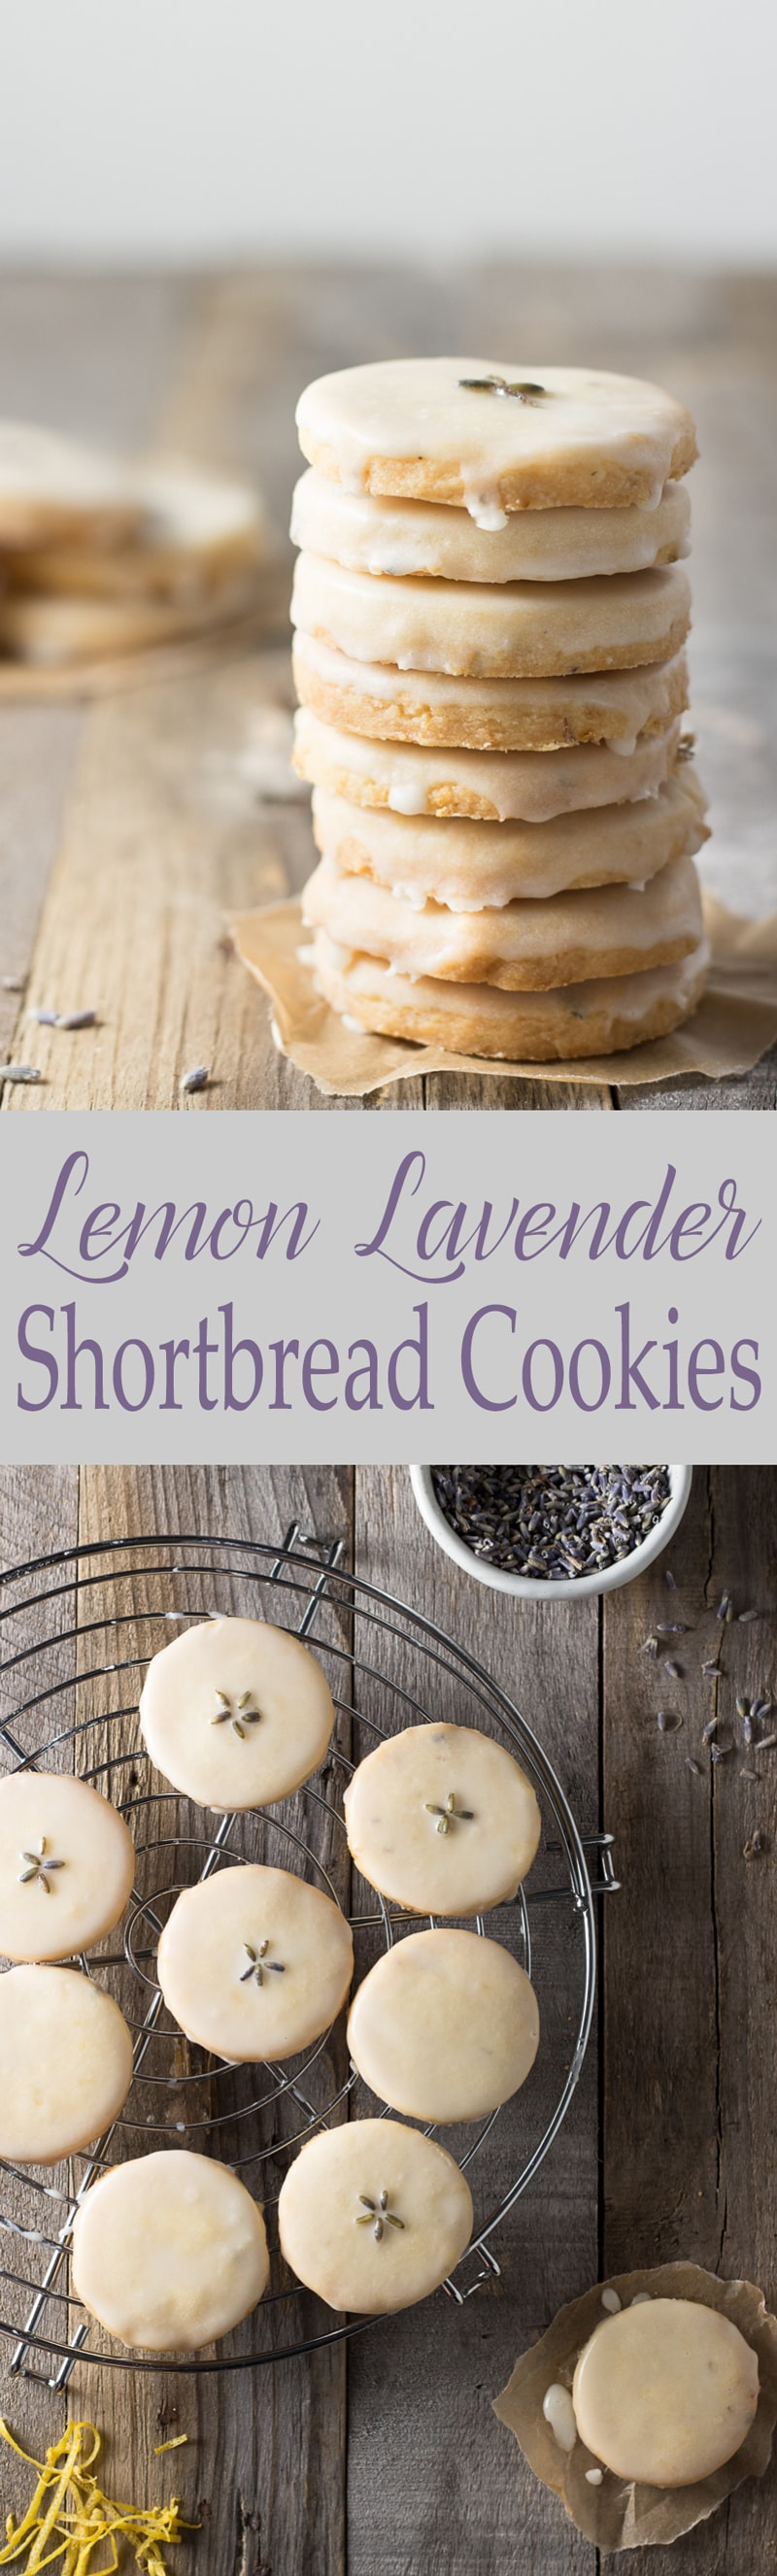 Lemon Lavender Shortbread Cookies | Brinasbites.com @Brina's Bites